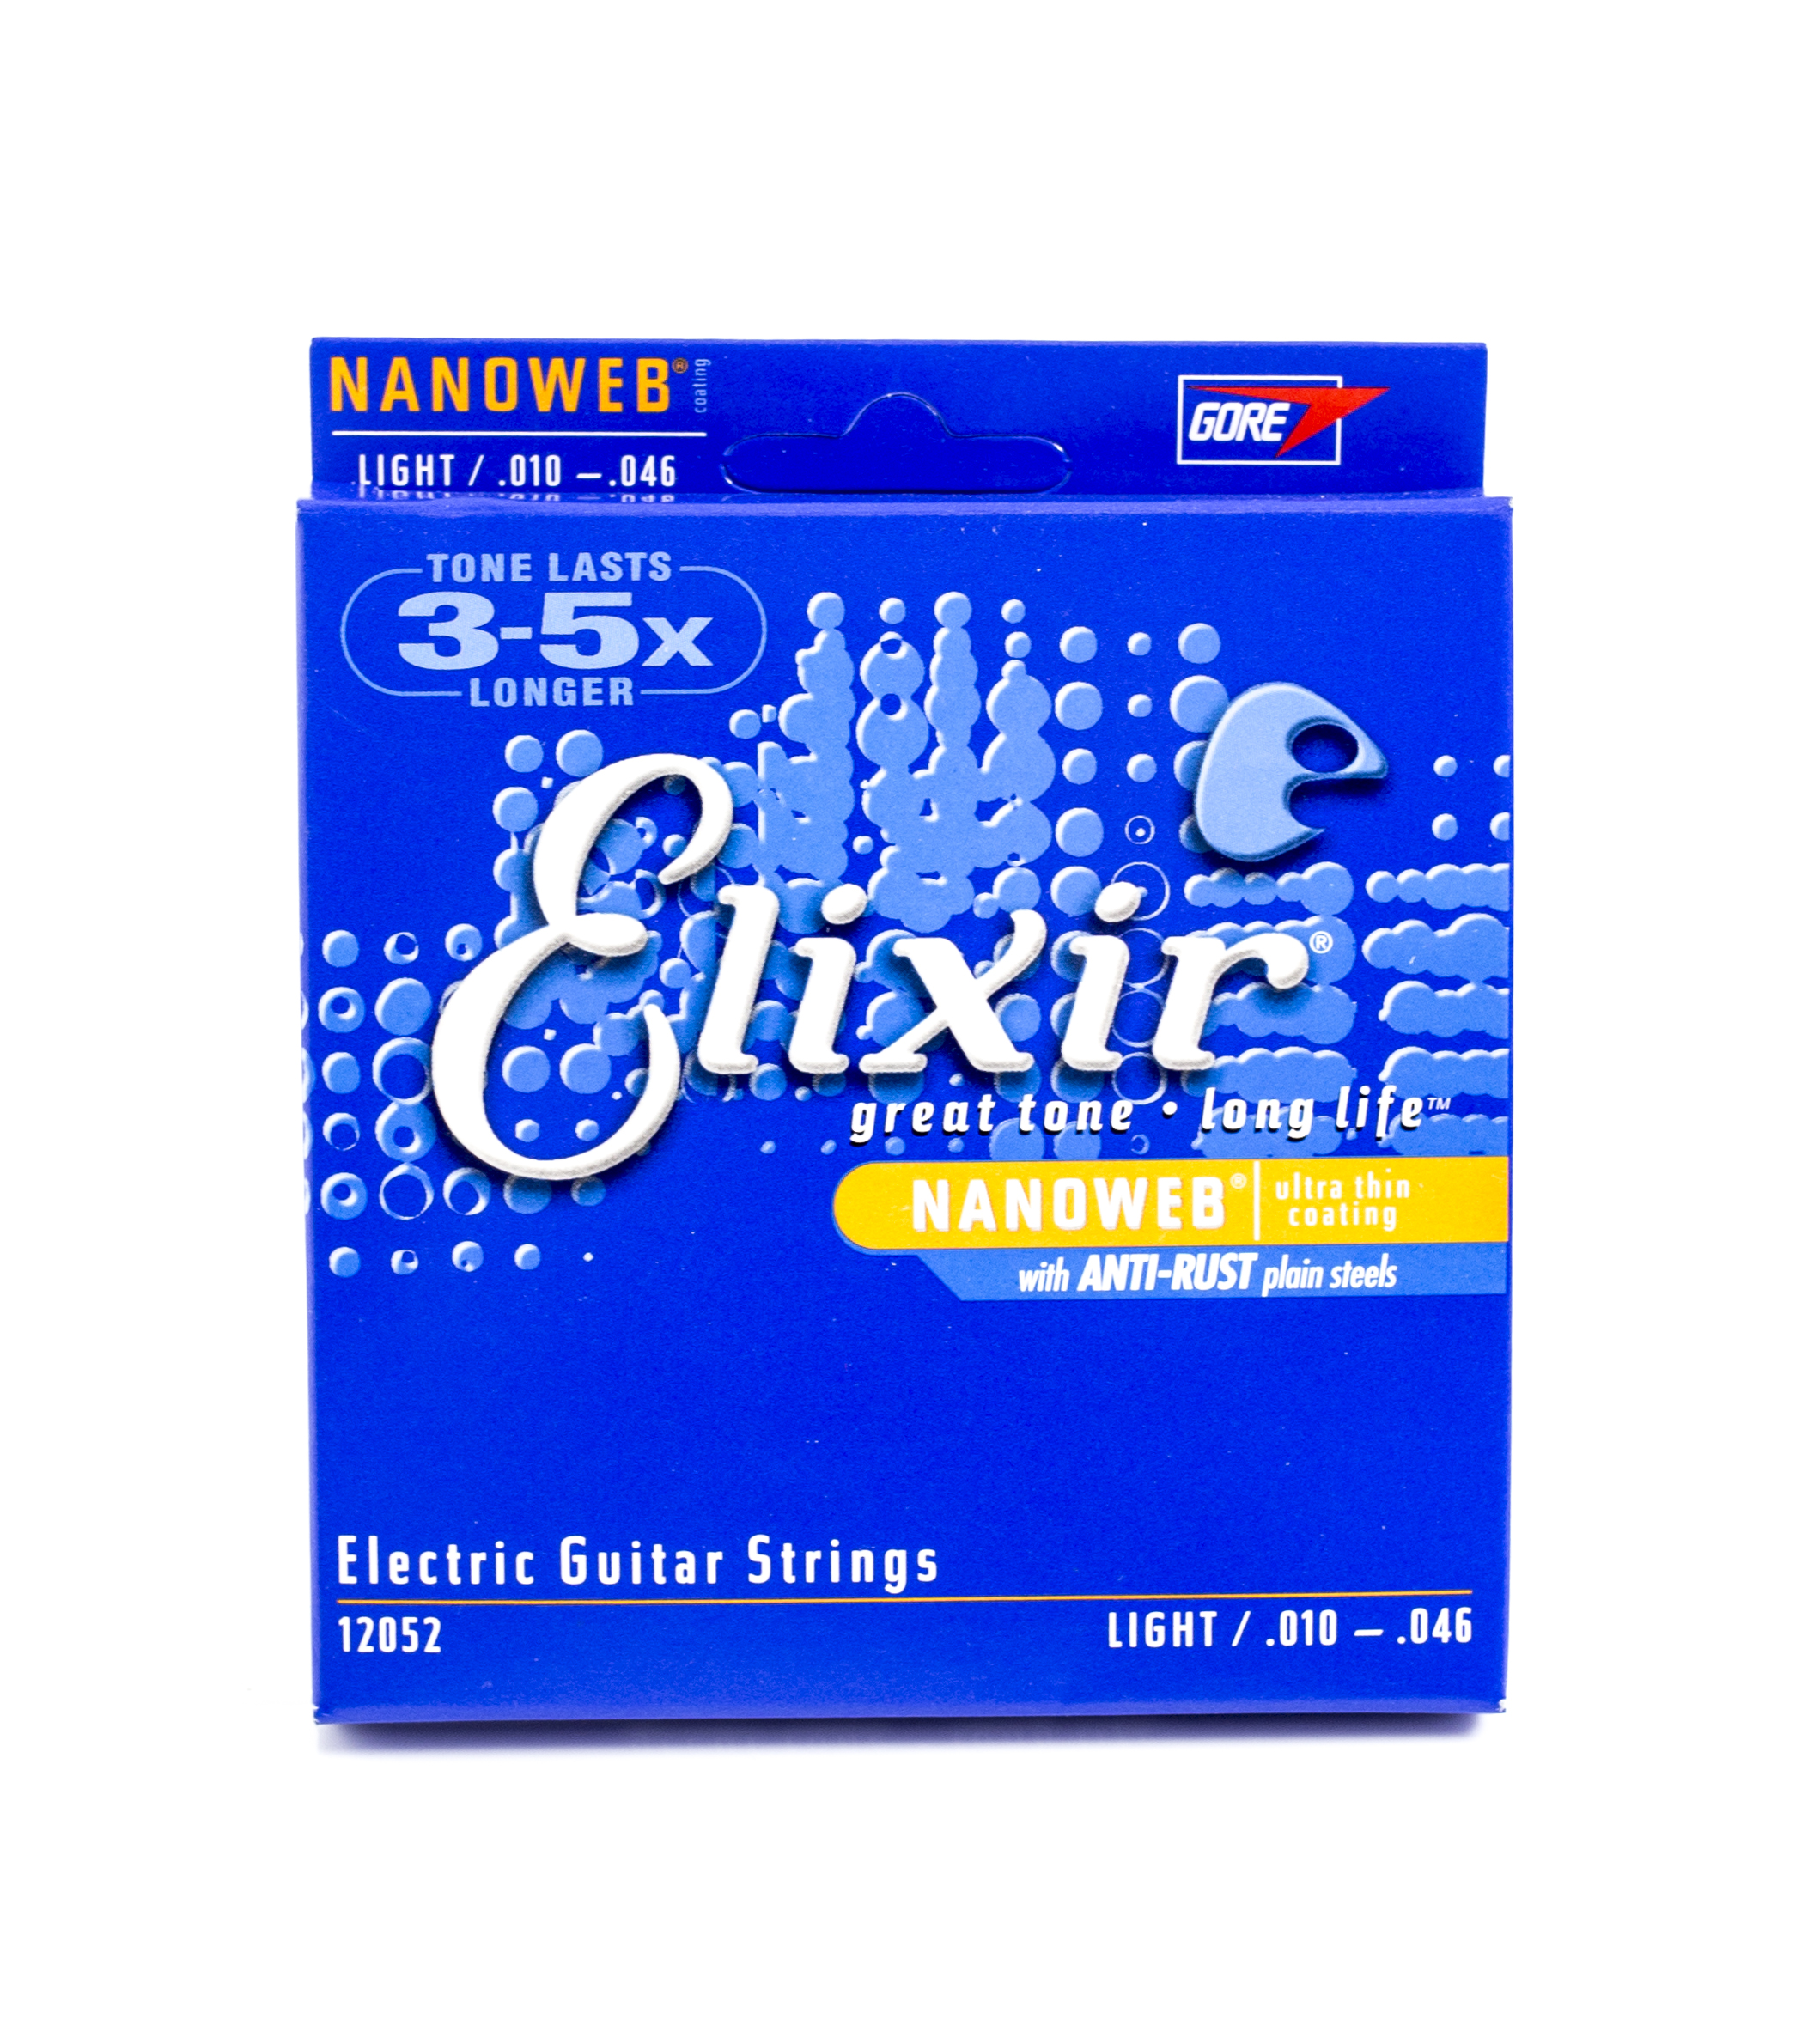 Nanoweb Electric Guitar Strings Reg Light 10-46: Strings